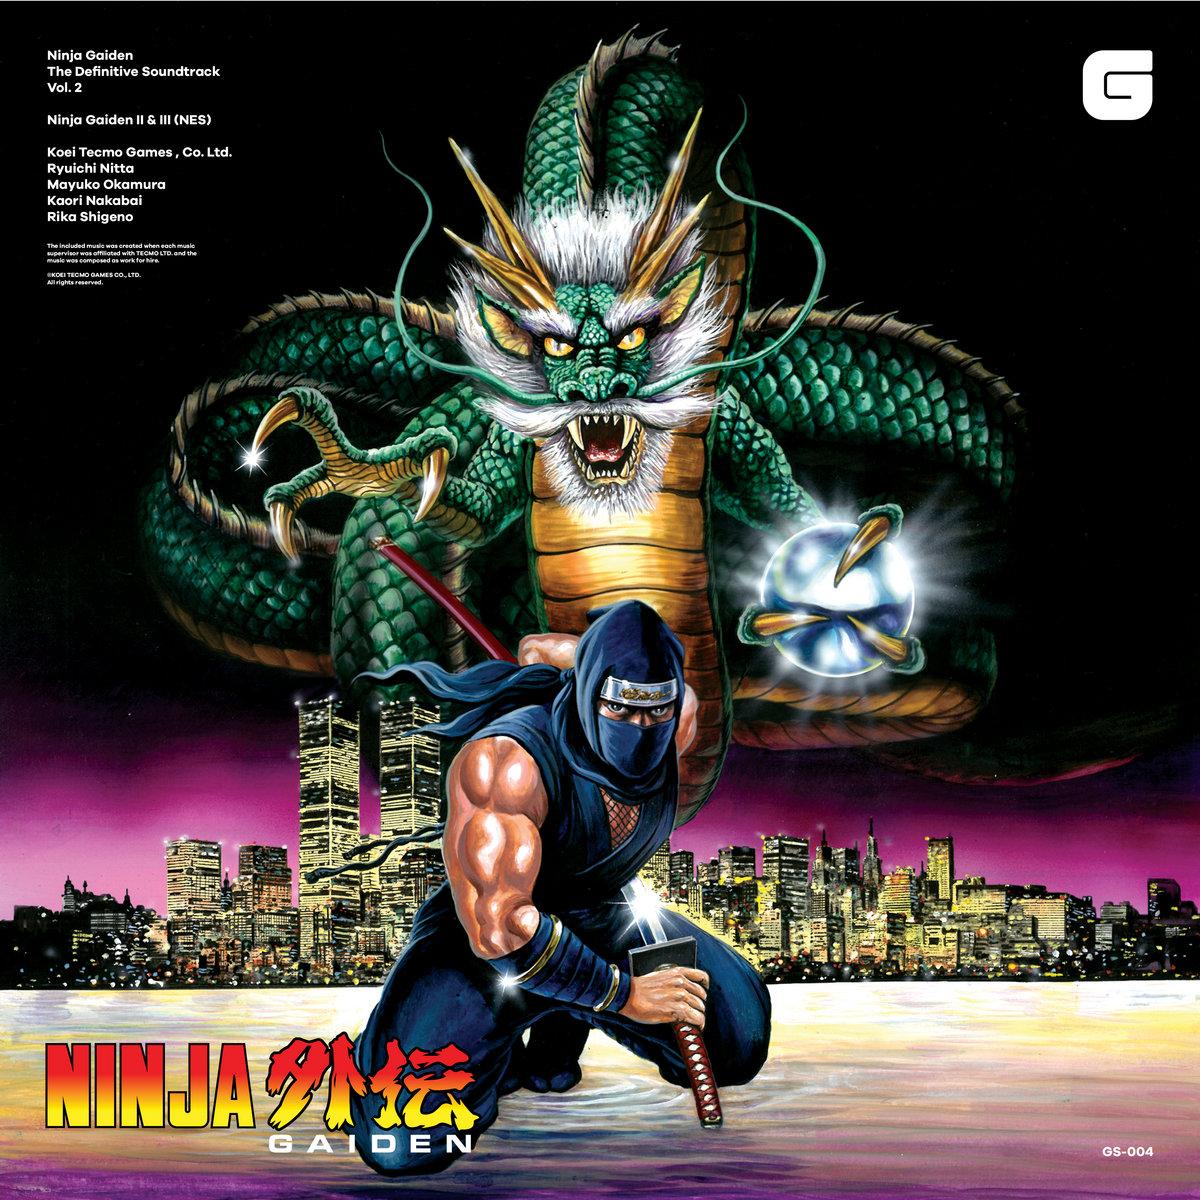 ninja gaiden 3 nes rom